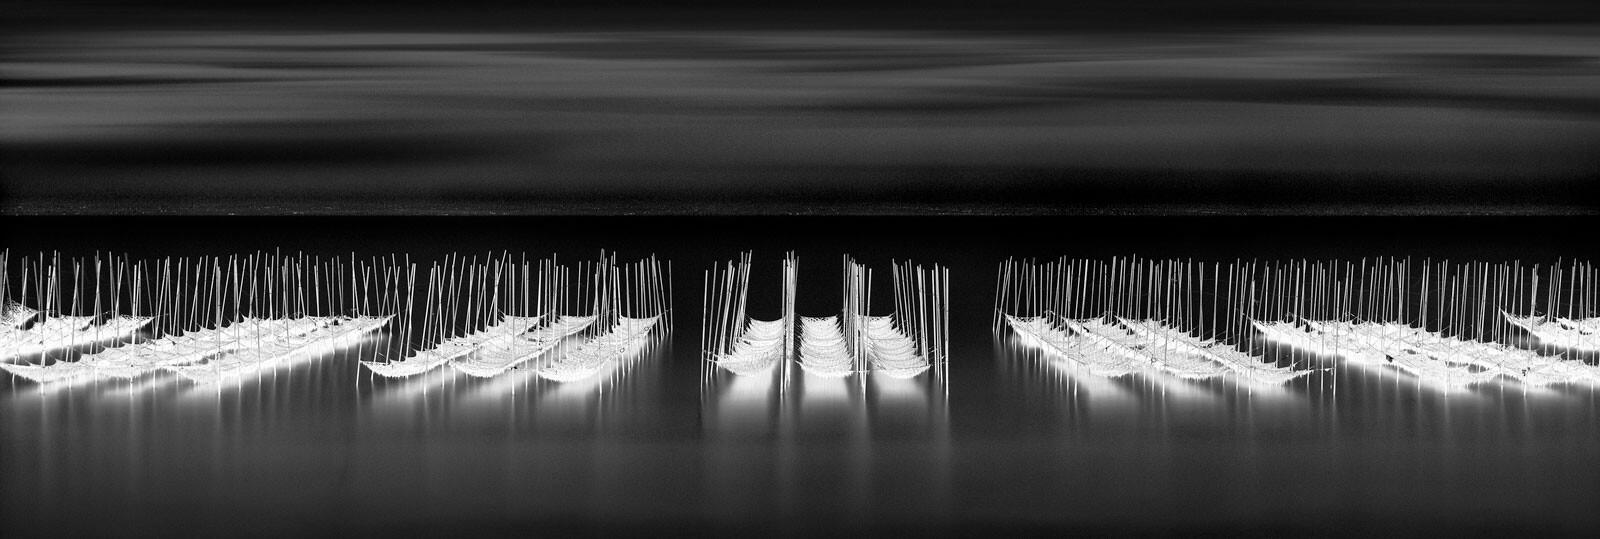 Atsumi Nets - Michael Levin